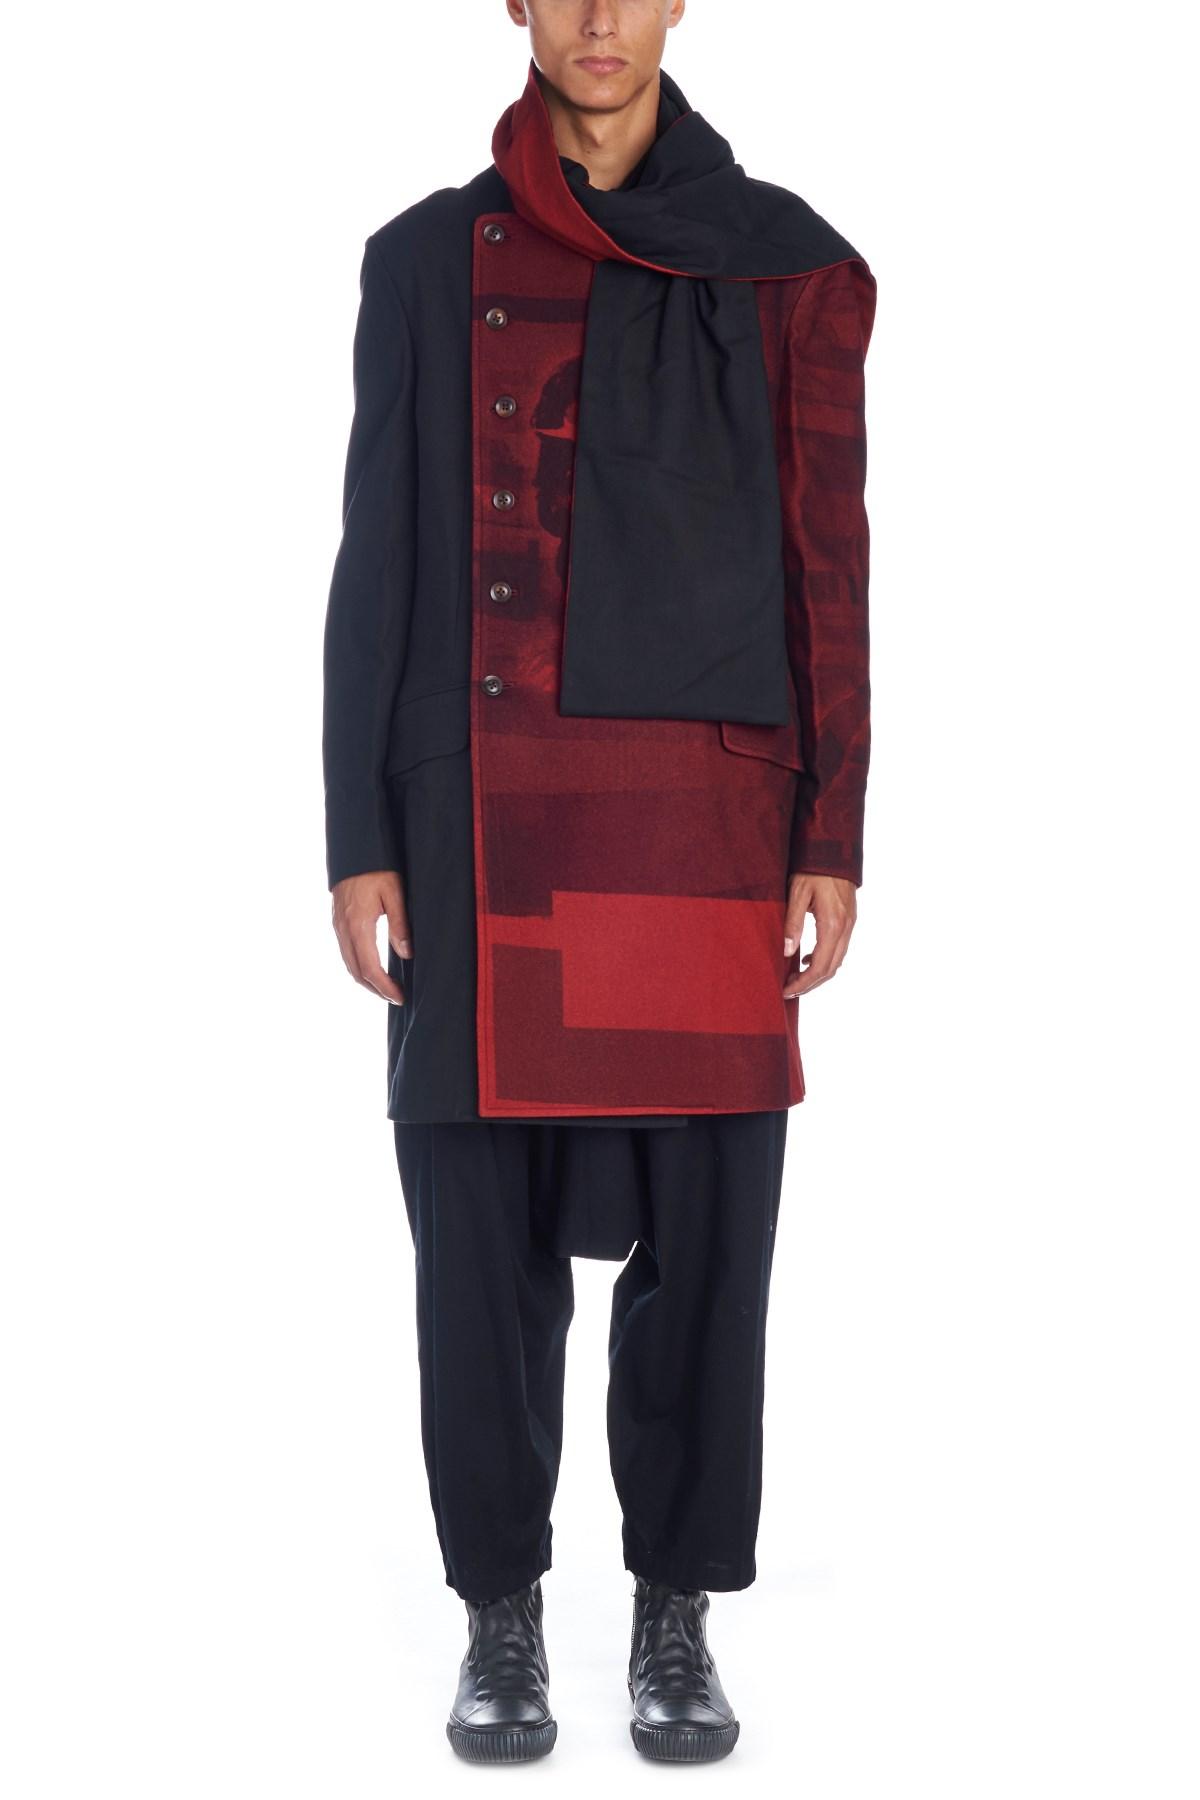 17399297e9f2 yohji yamamoto coat with stole available on julian-fashion.com - 58143